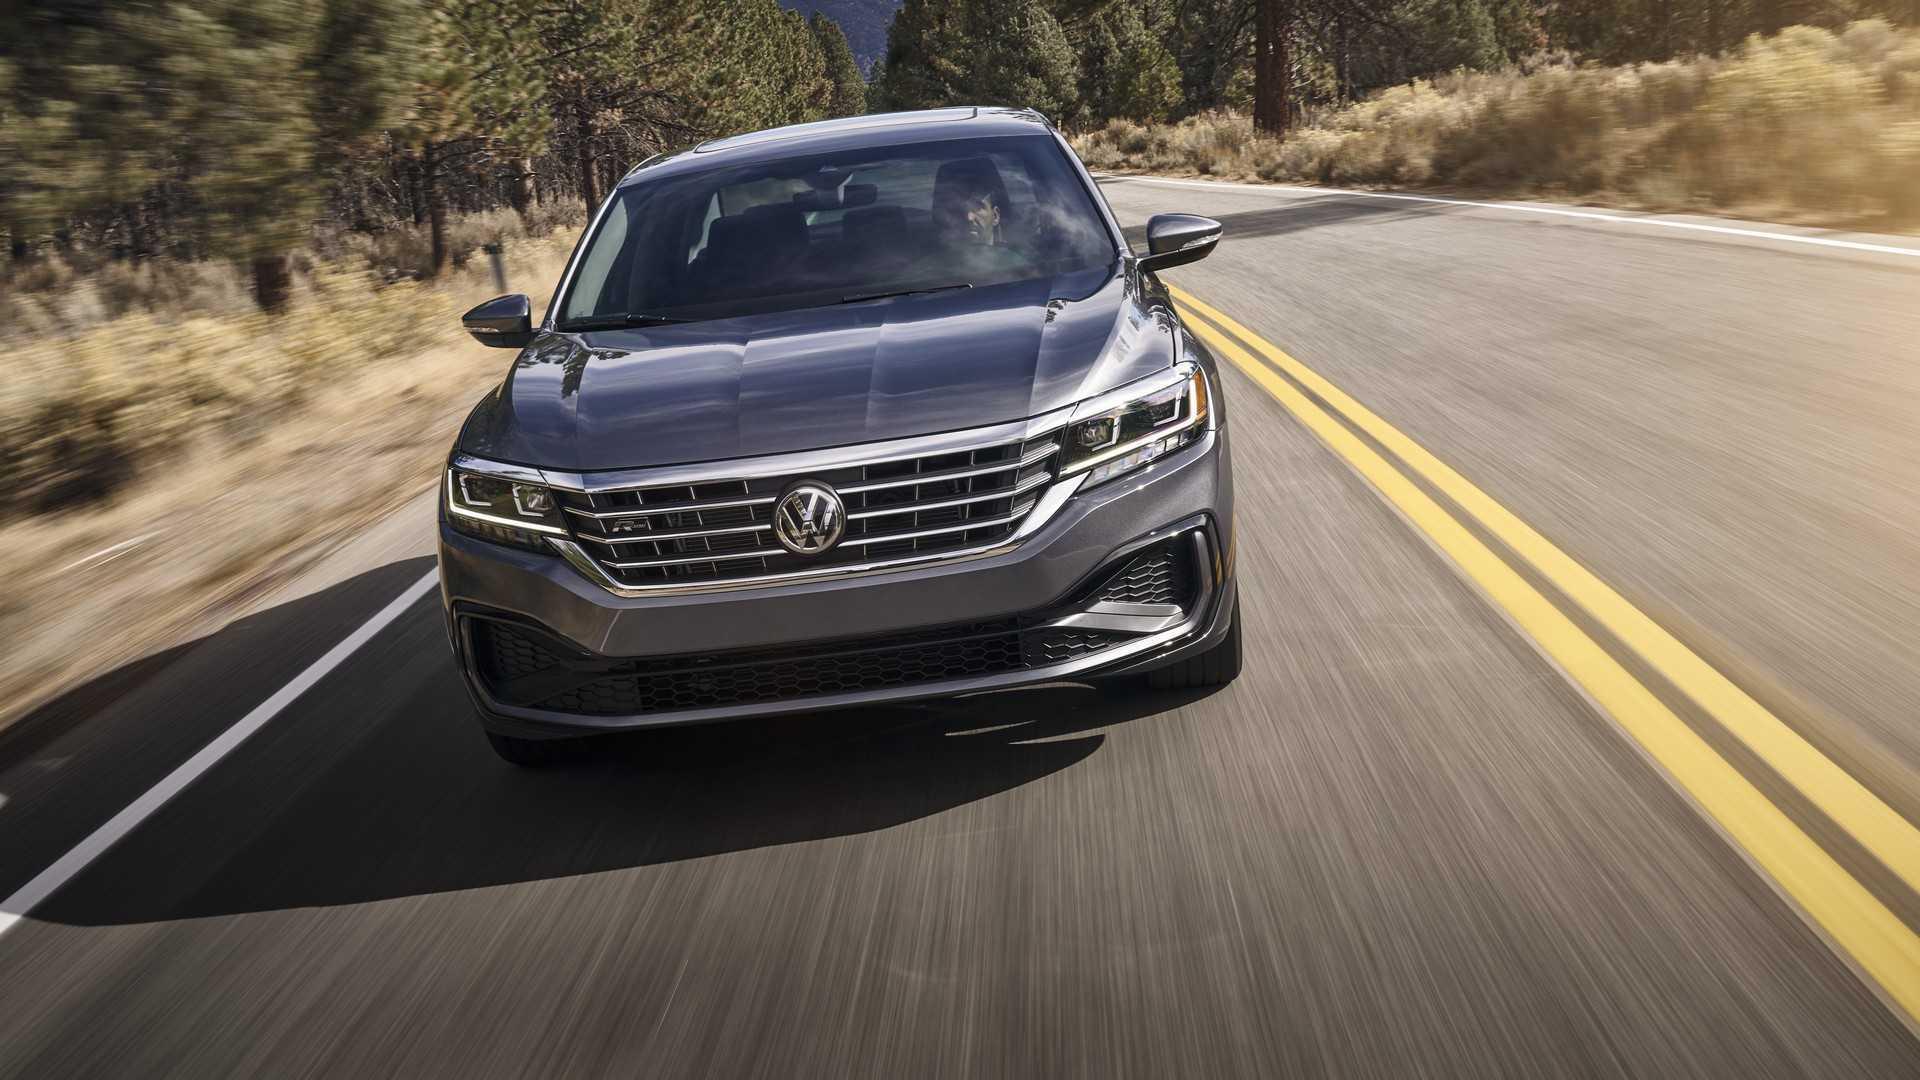 30 All New Volkswagen Cc 2020 Ratings for Volkswagen Cc 2020